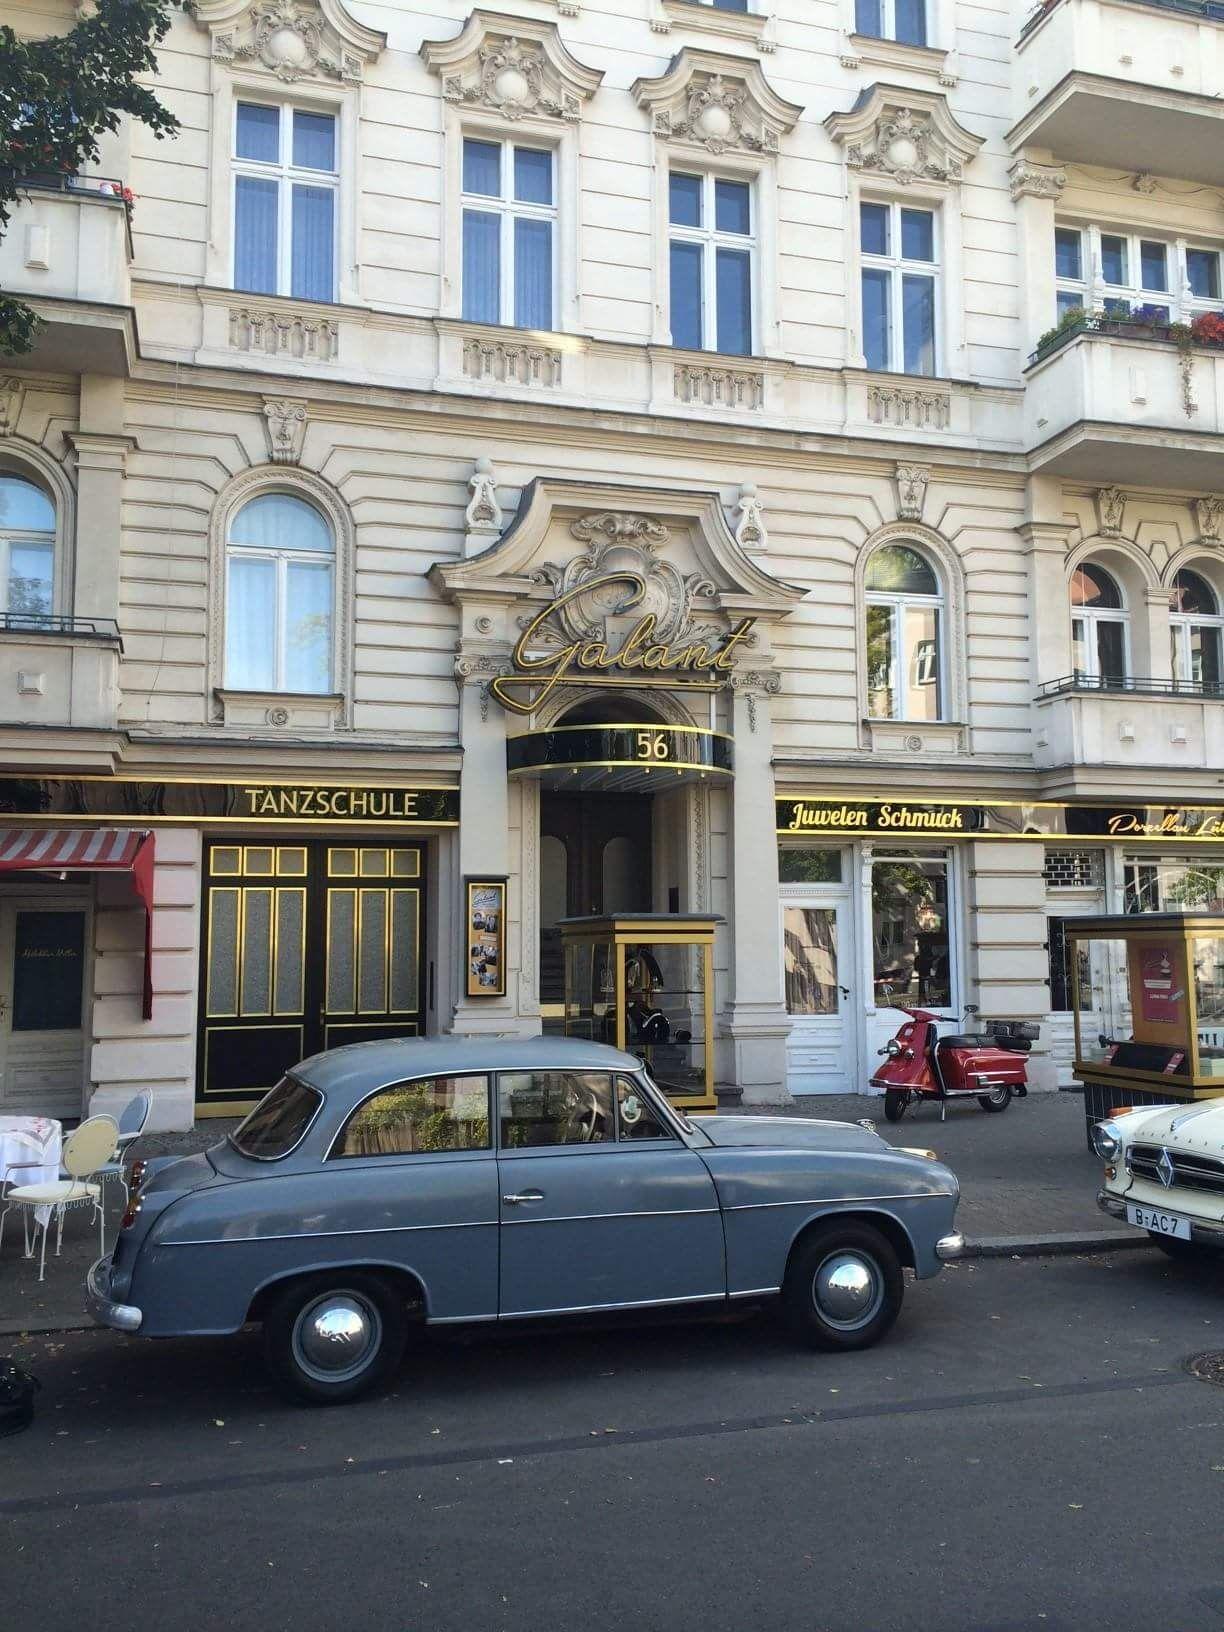 Tanzschule Galant Berlin